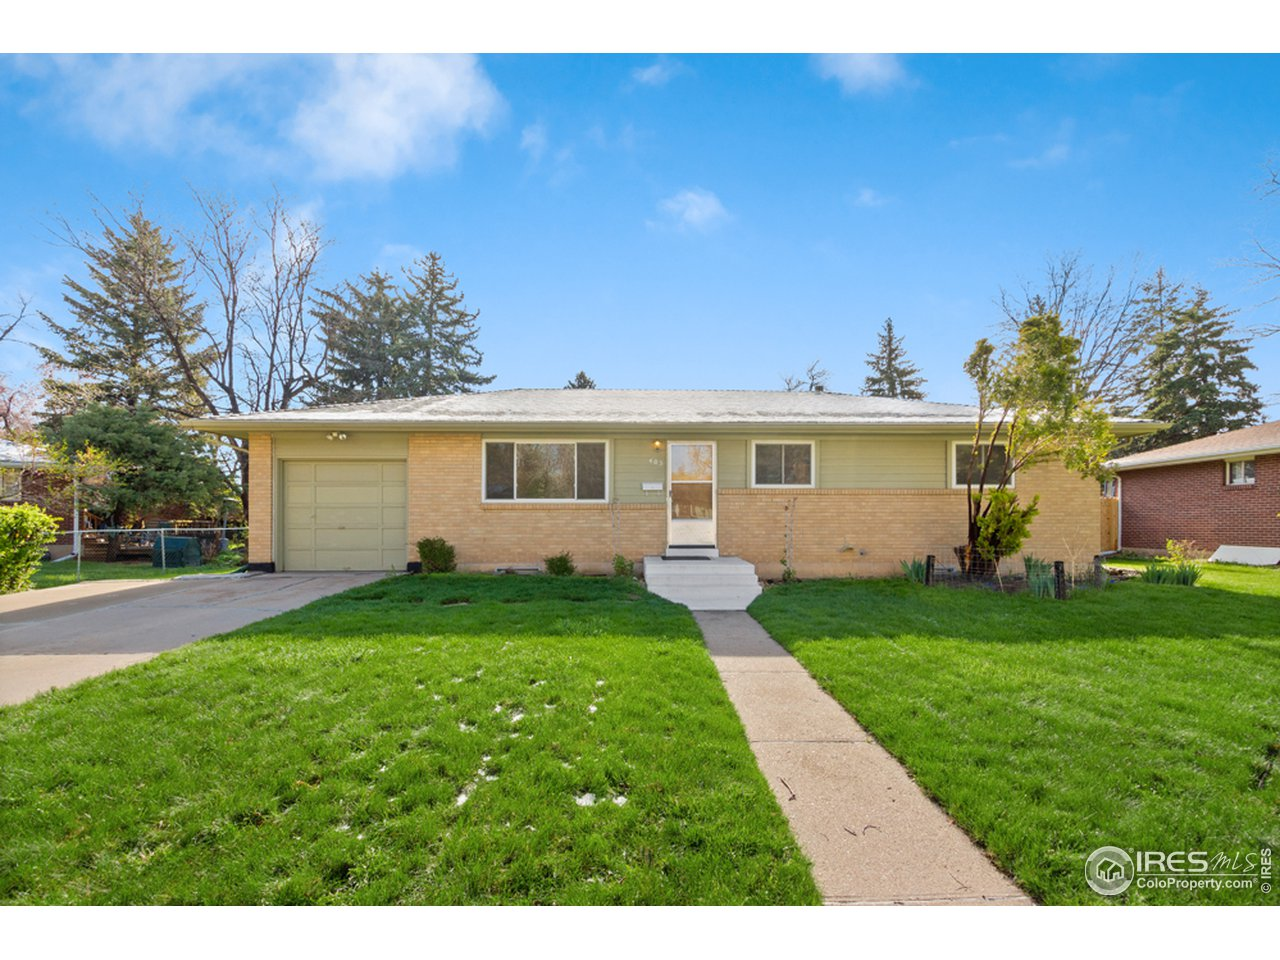 405 Duke Ln, Fort Collins CO 80525